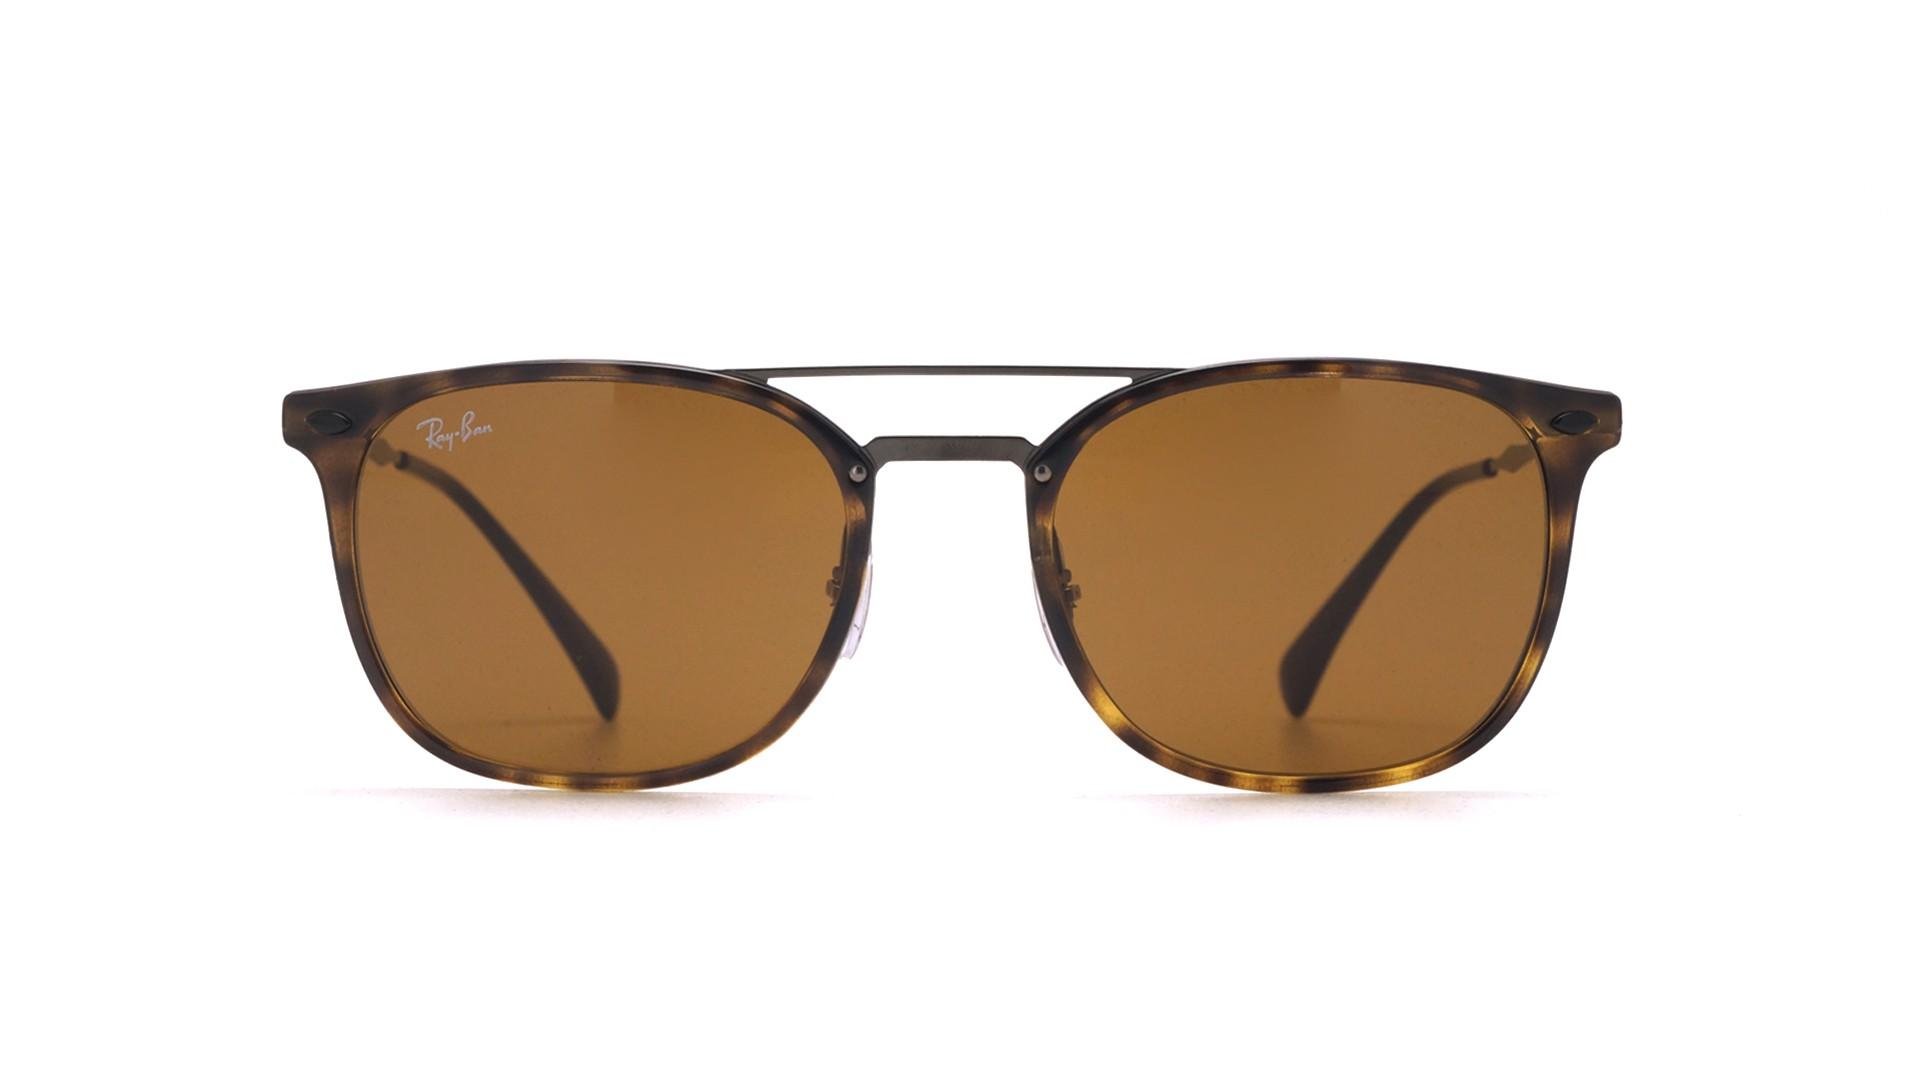 5015964a5f Sunglasses Ray-Ban Tech Tortoise RB4286 710 73 55-21 Large